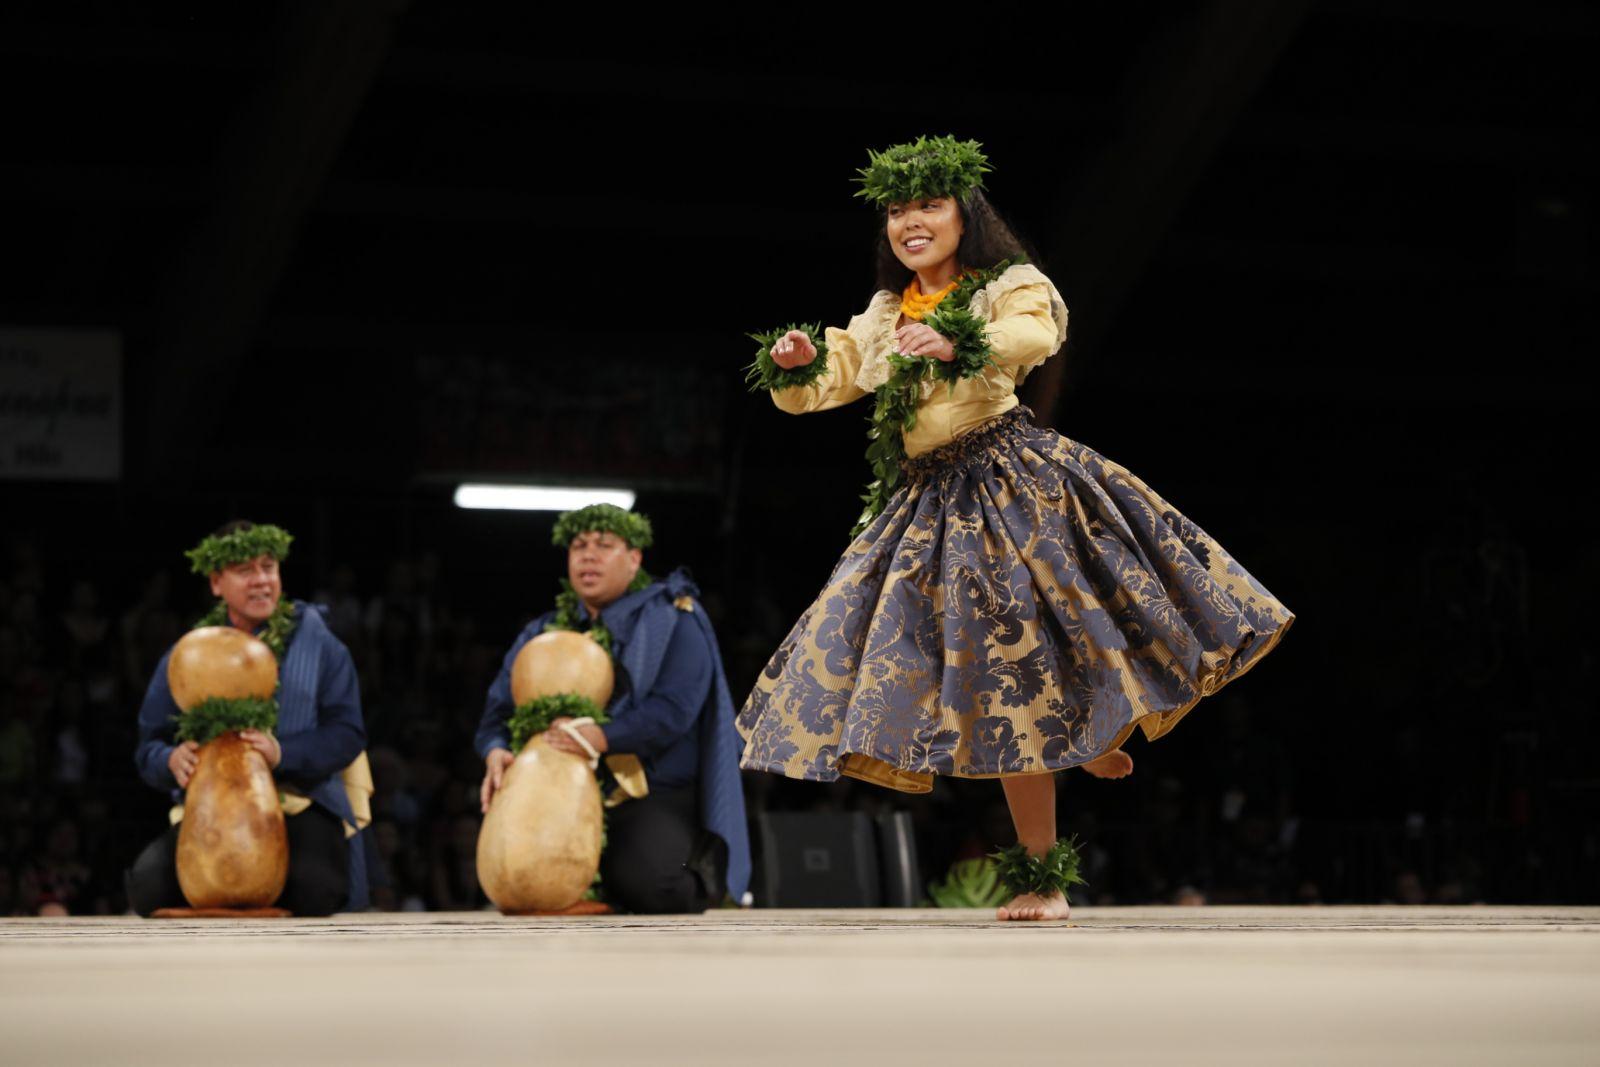 Miss Aloha Hula 2017 – Kelina Kiyoko Keʻanoʻilehua Tiffany Eldredge